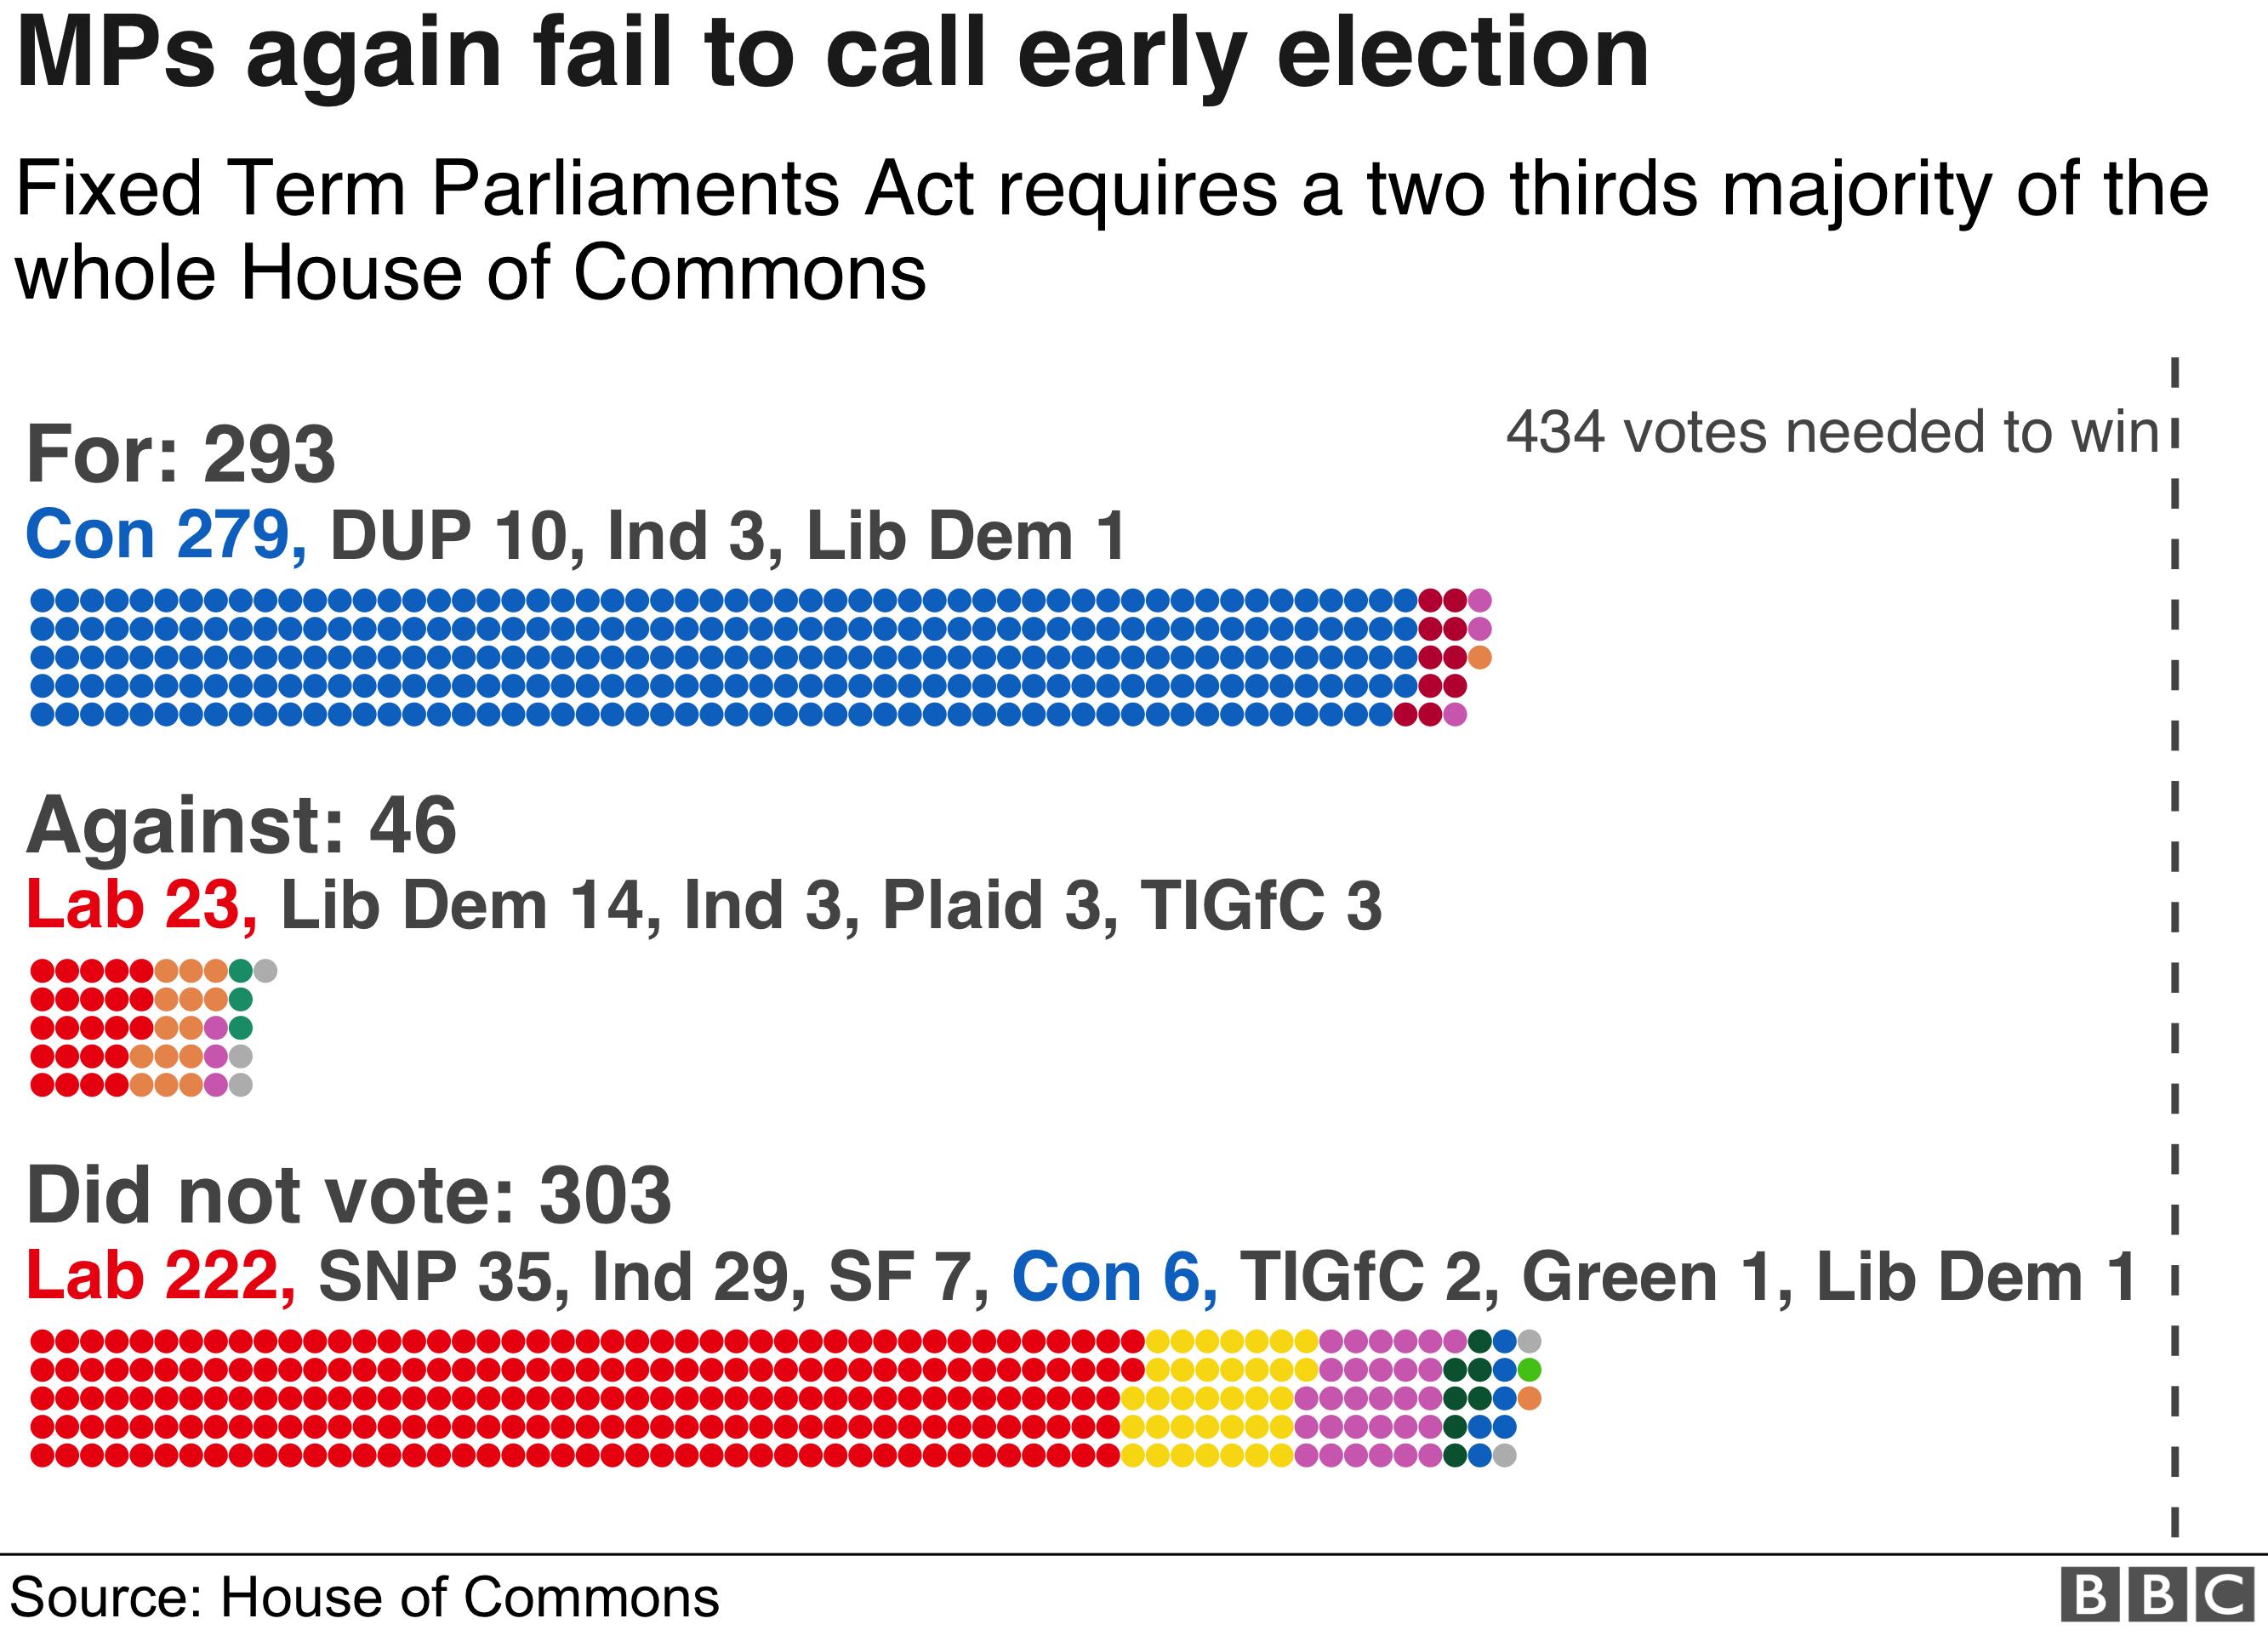 For: 293 - Con 279, DUP 10, Ind 3, Lib Dem 1. Against: 46 - Lab 23, Lib Dem 14, Ind 3, Plaid 3, TIGfC 3. Did not vote: 303 - Lab 222, SNP 35, Ind 29, SF 7, Con 6, TIGfC 2, Green 1, Lib Dem 1